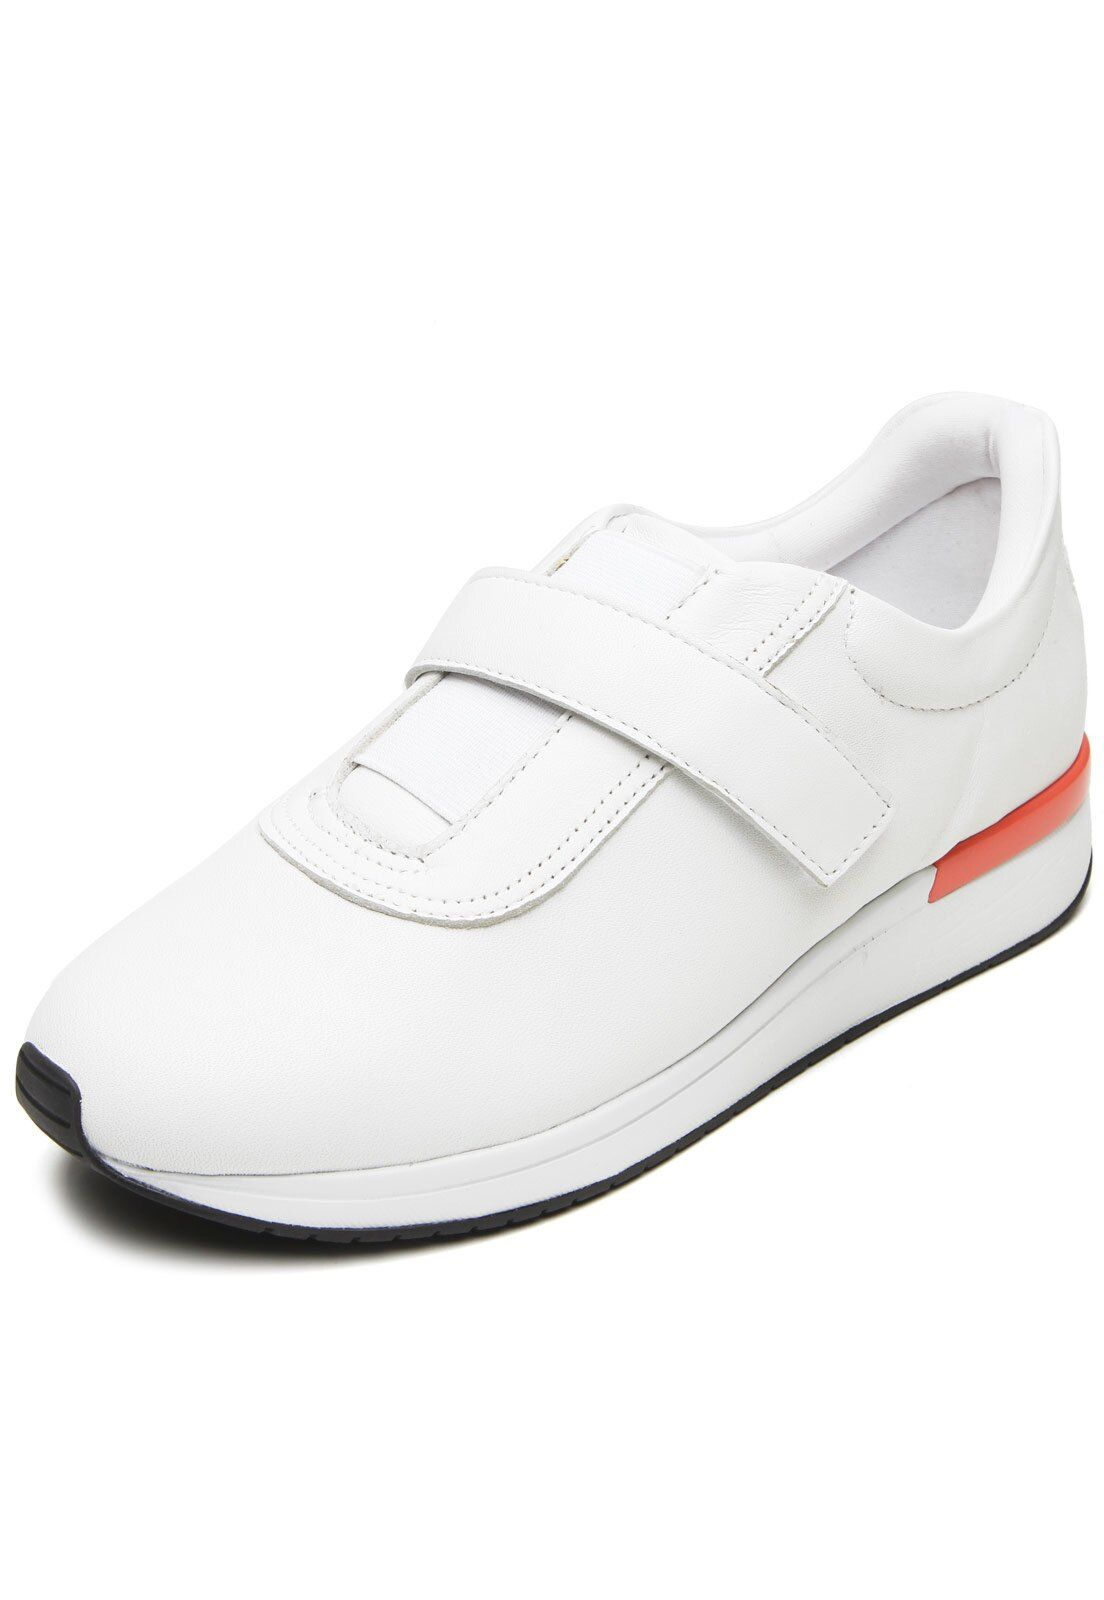 Tênis Usaflex Couro Branco